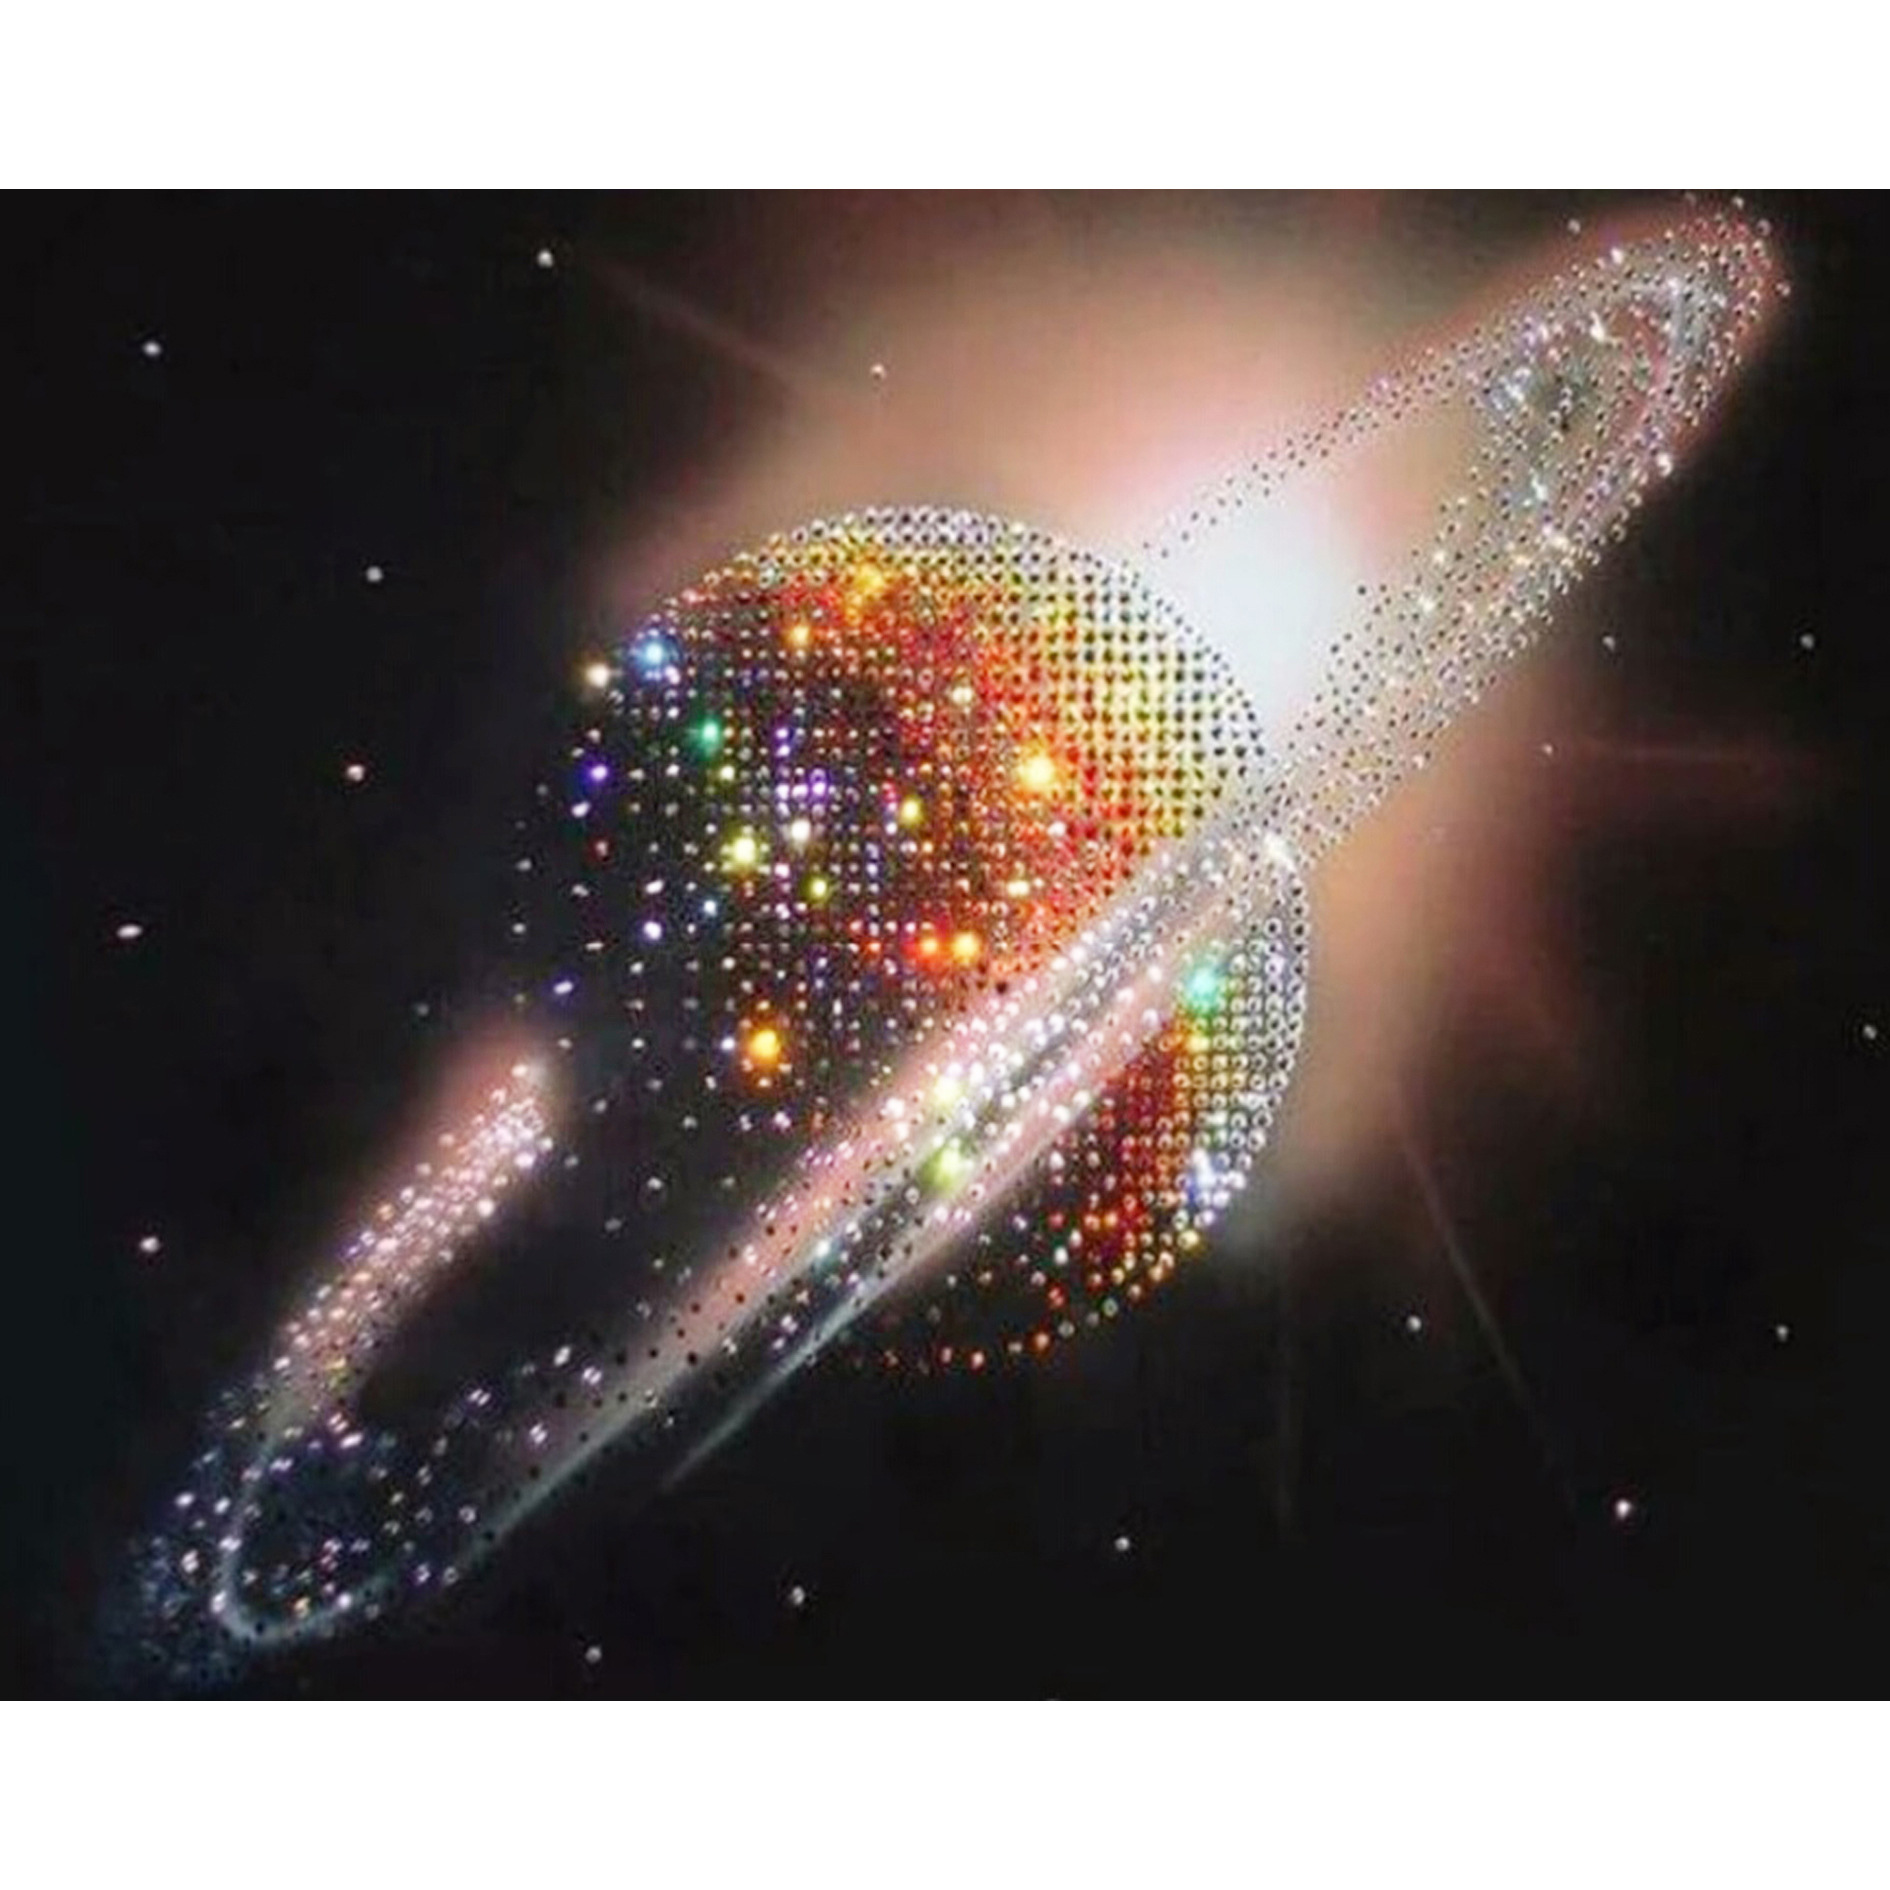 5D DIY Diamond Embroidery Star Scenery Full Square/ Round Diamond Painting Cross Stitch Diamond  Crystal Wall Painting